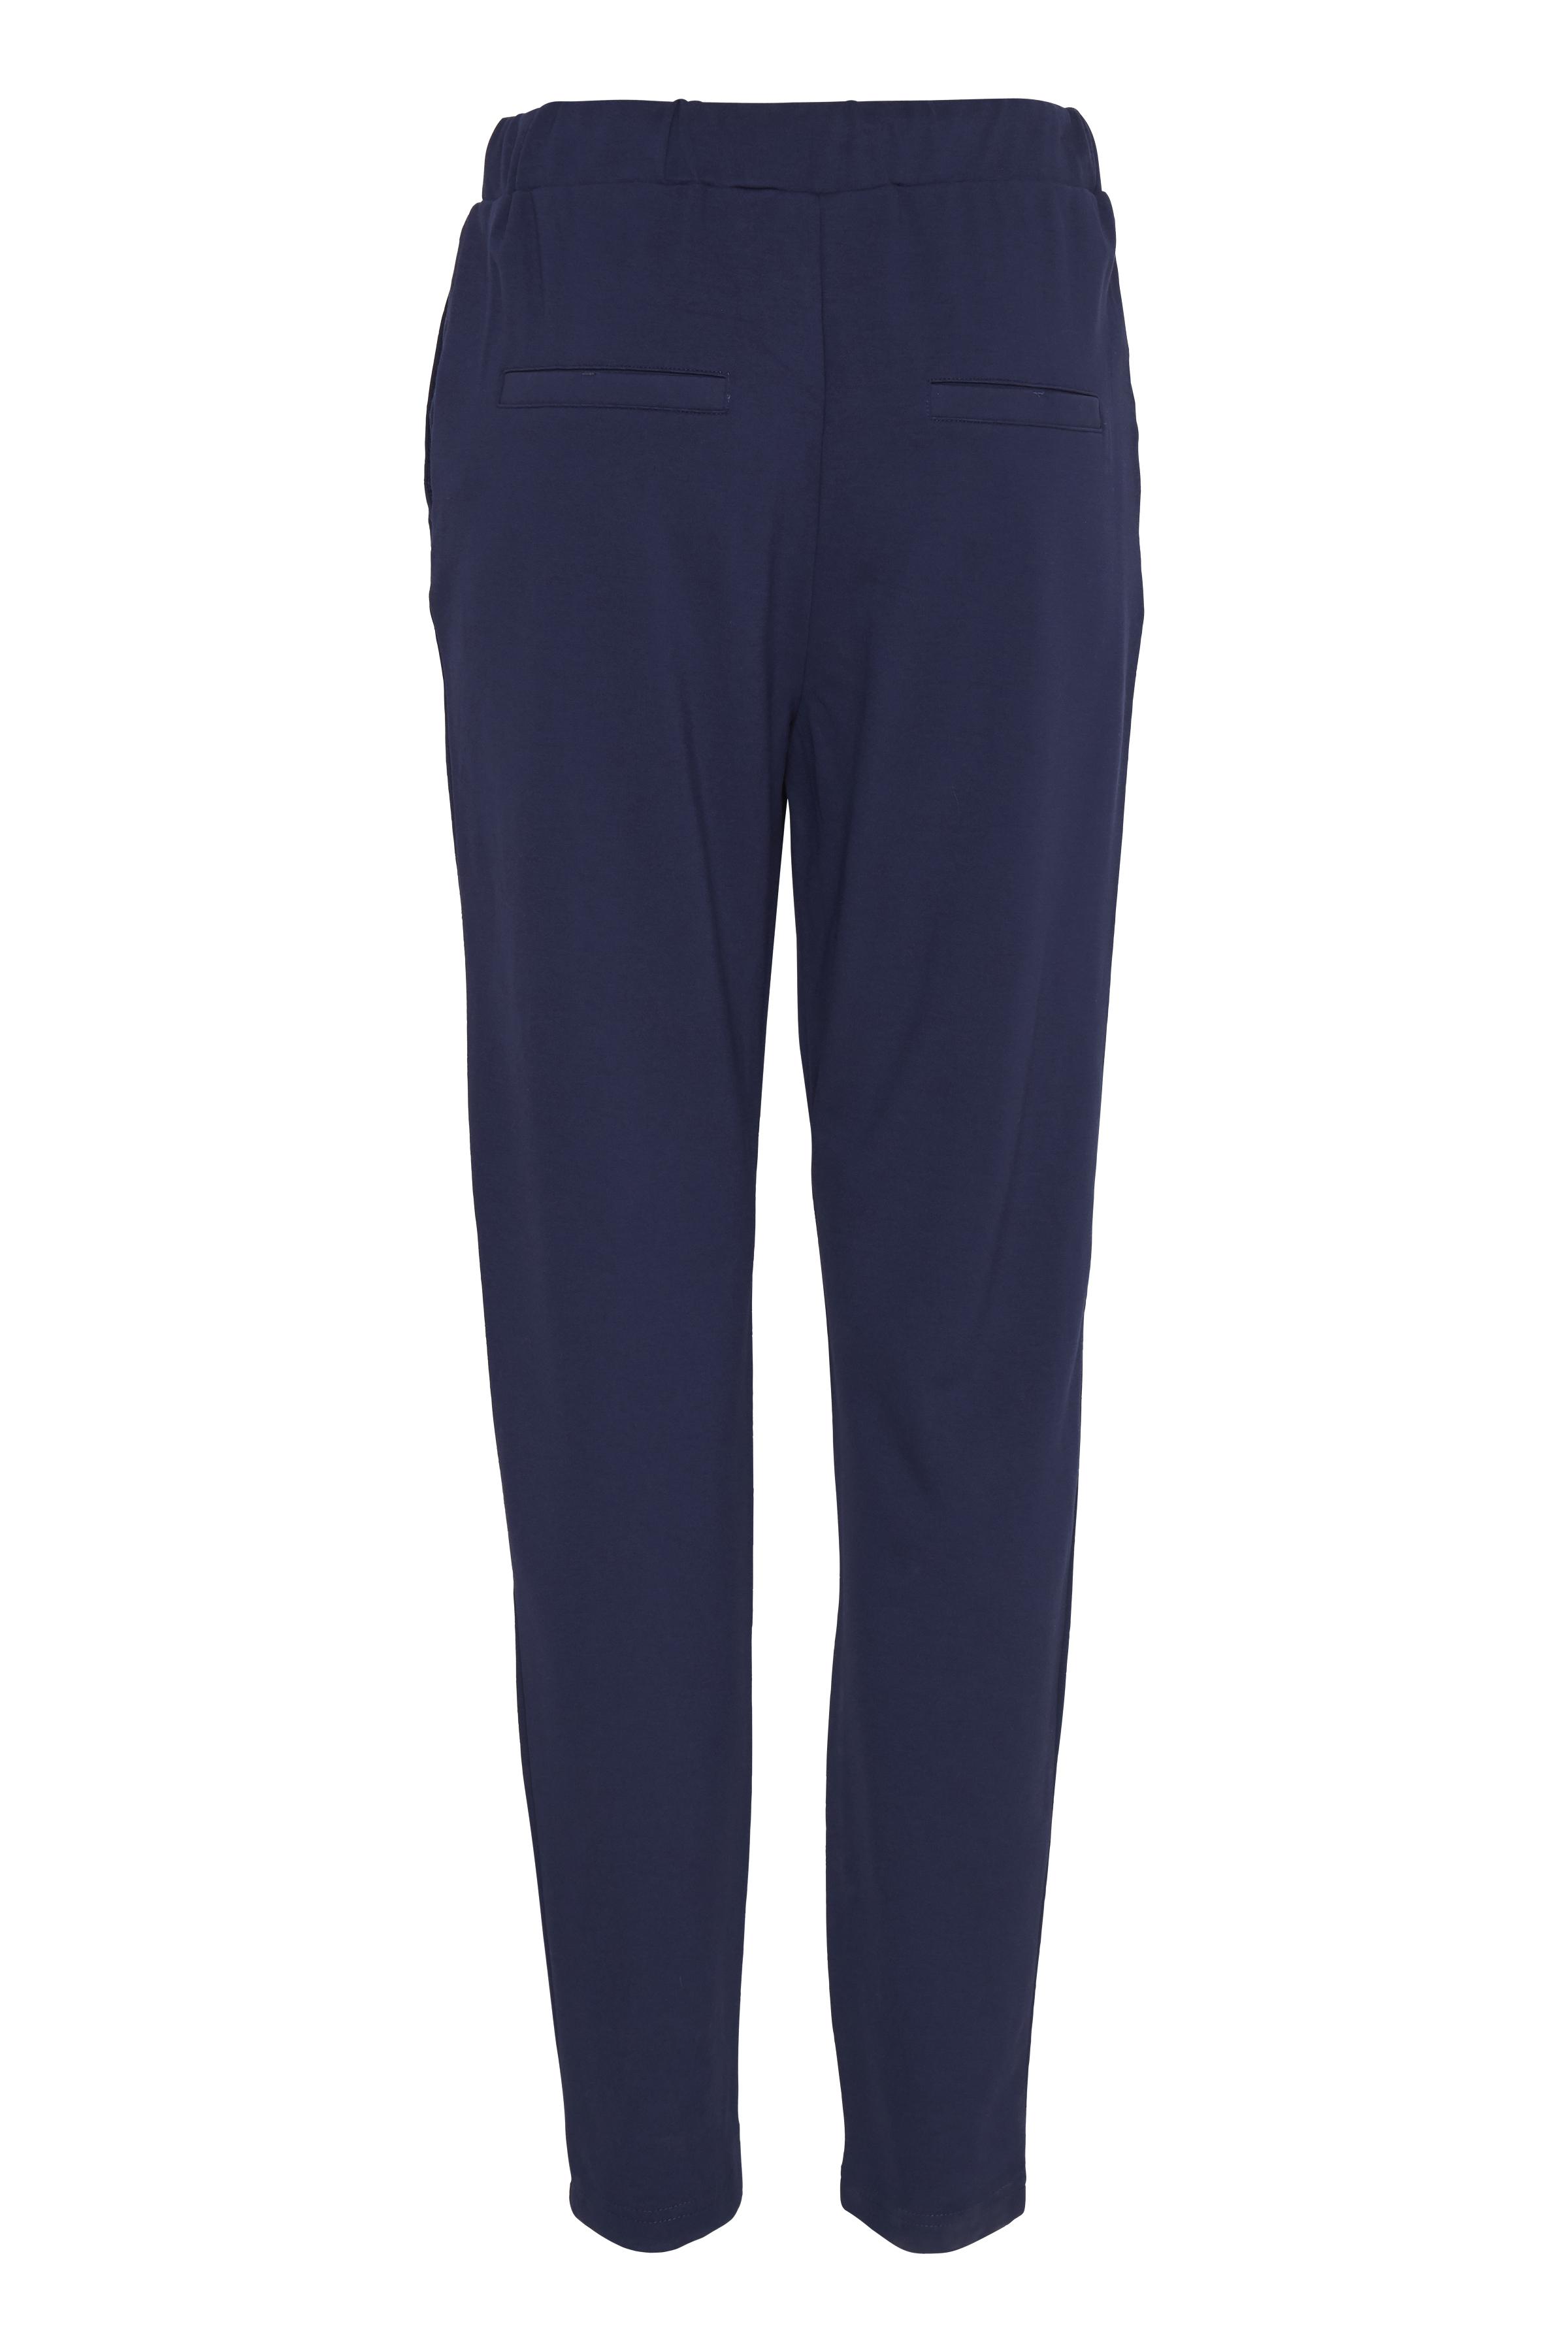 Marineblau Casual Hose von Fransa – Shoppen Sie Marineblau Casual Hose ab Gr. XS-XXL hier